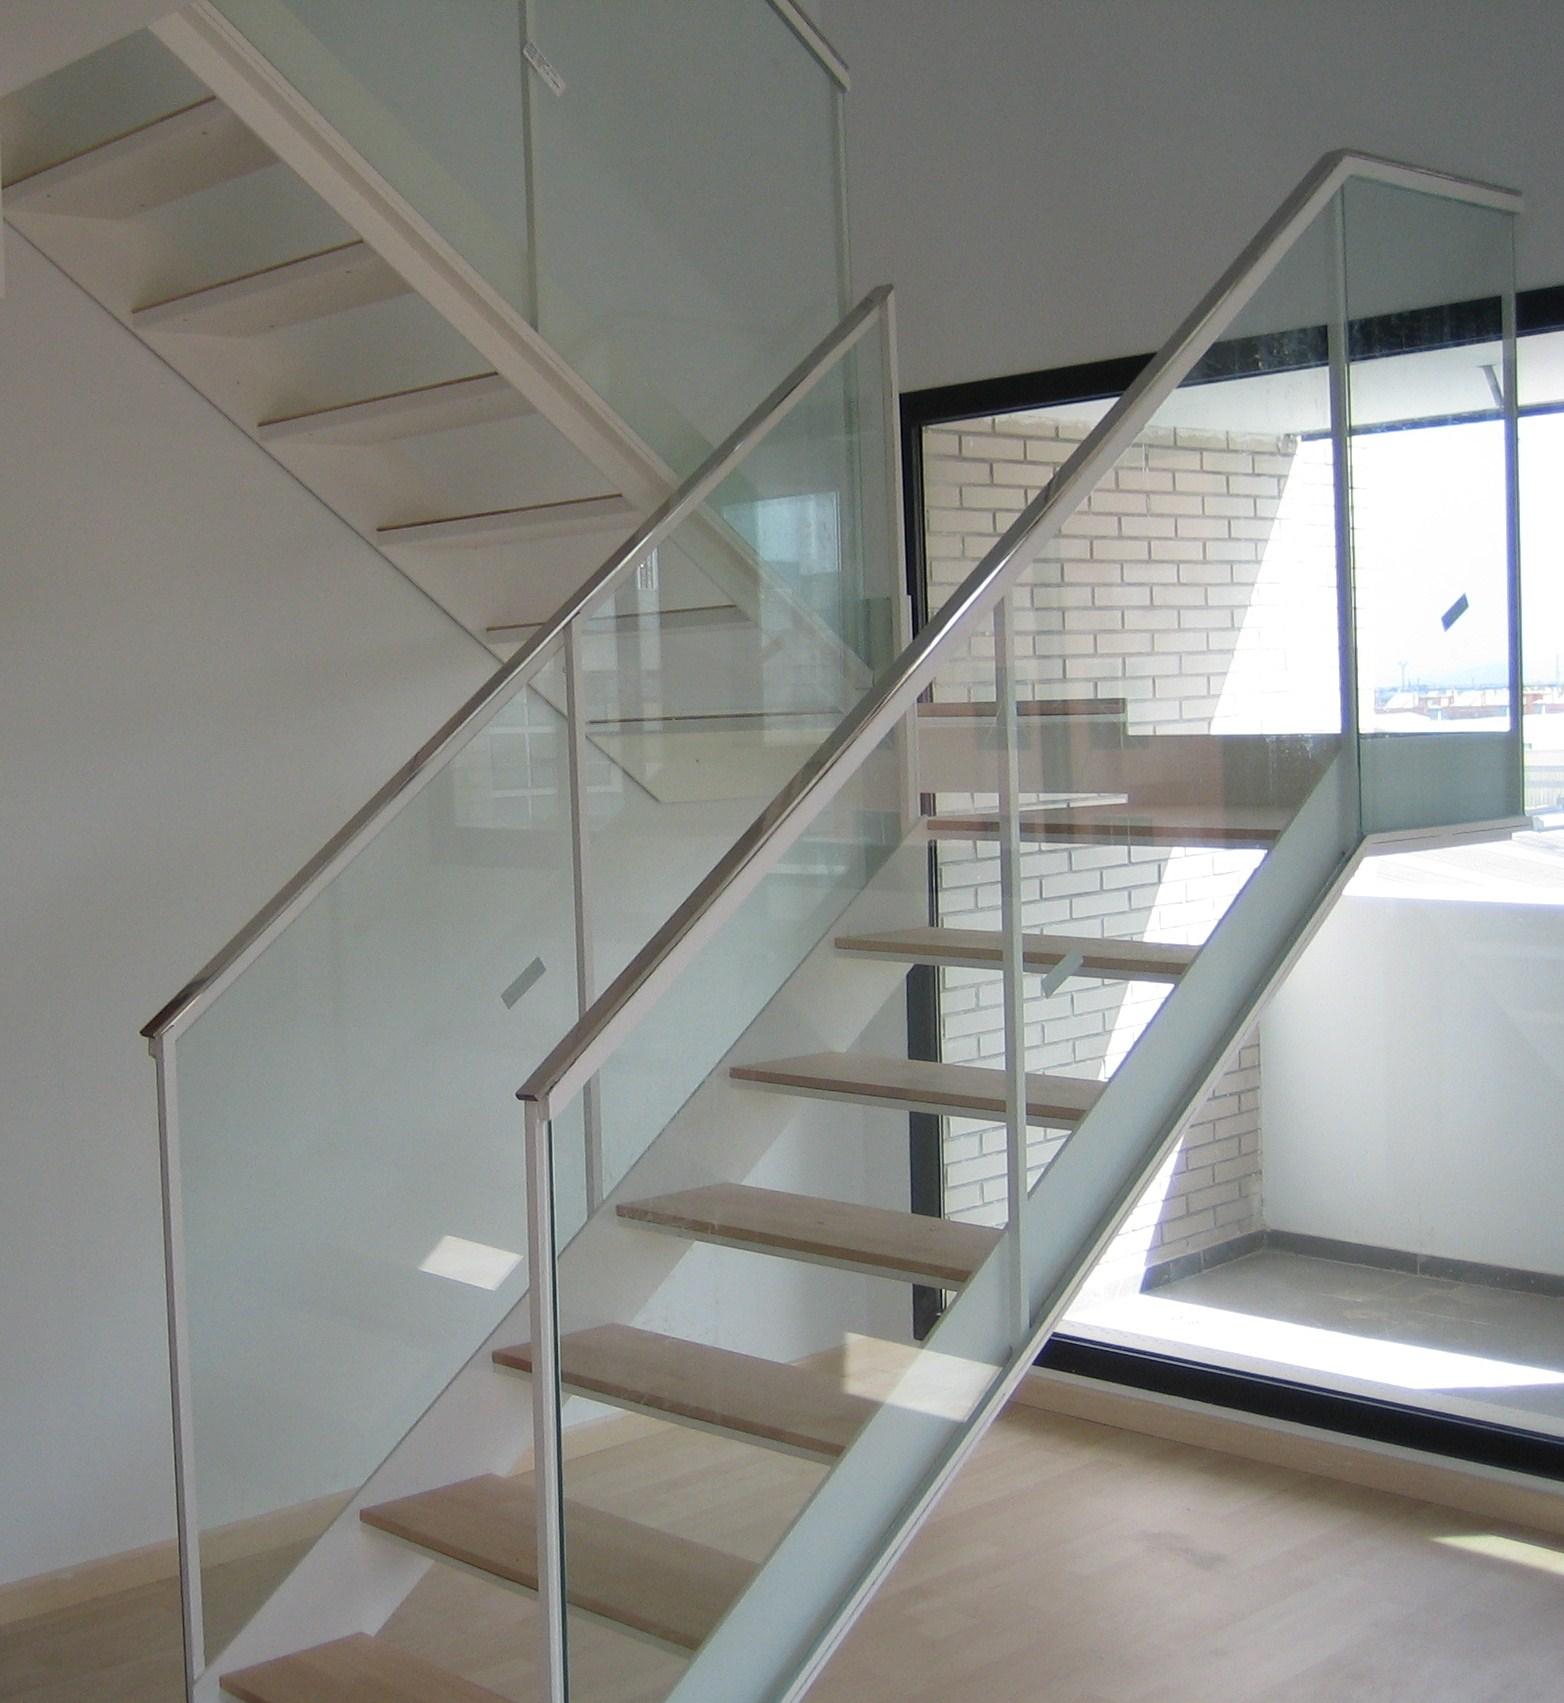 Barandilla vidrio perfect barandillas de vidrio madrid - Escalera metalica prefabricada ...